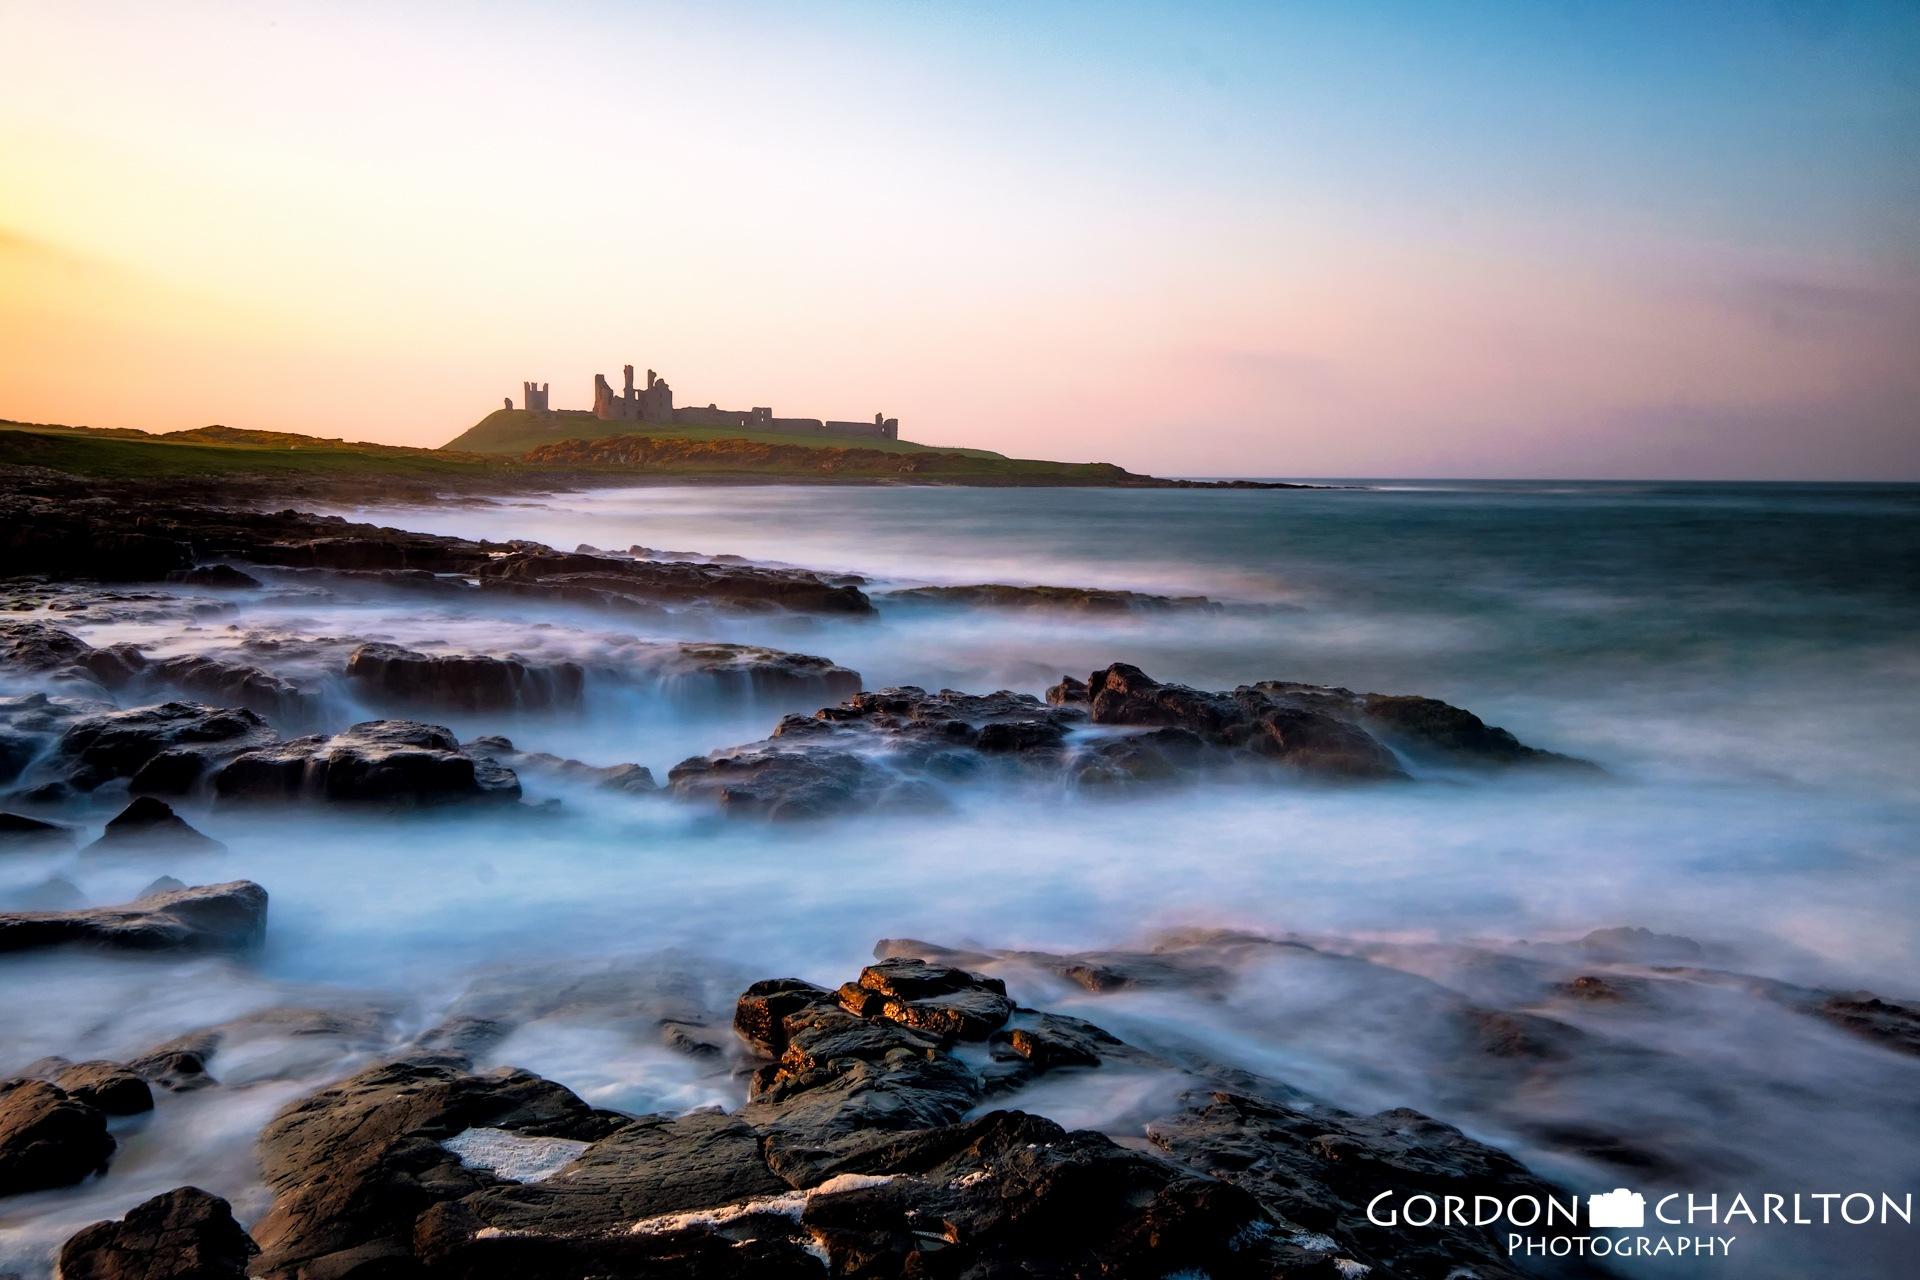 Sunset @ Dunstanburgh Castle by Gordon Charlton